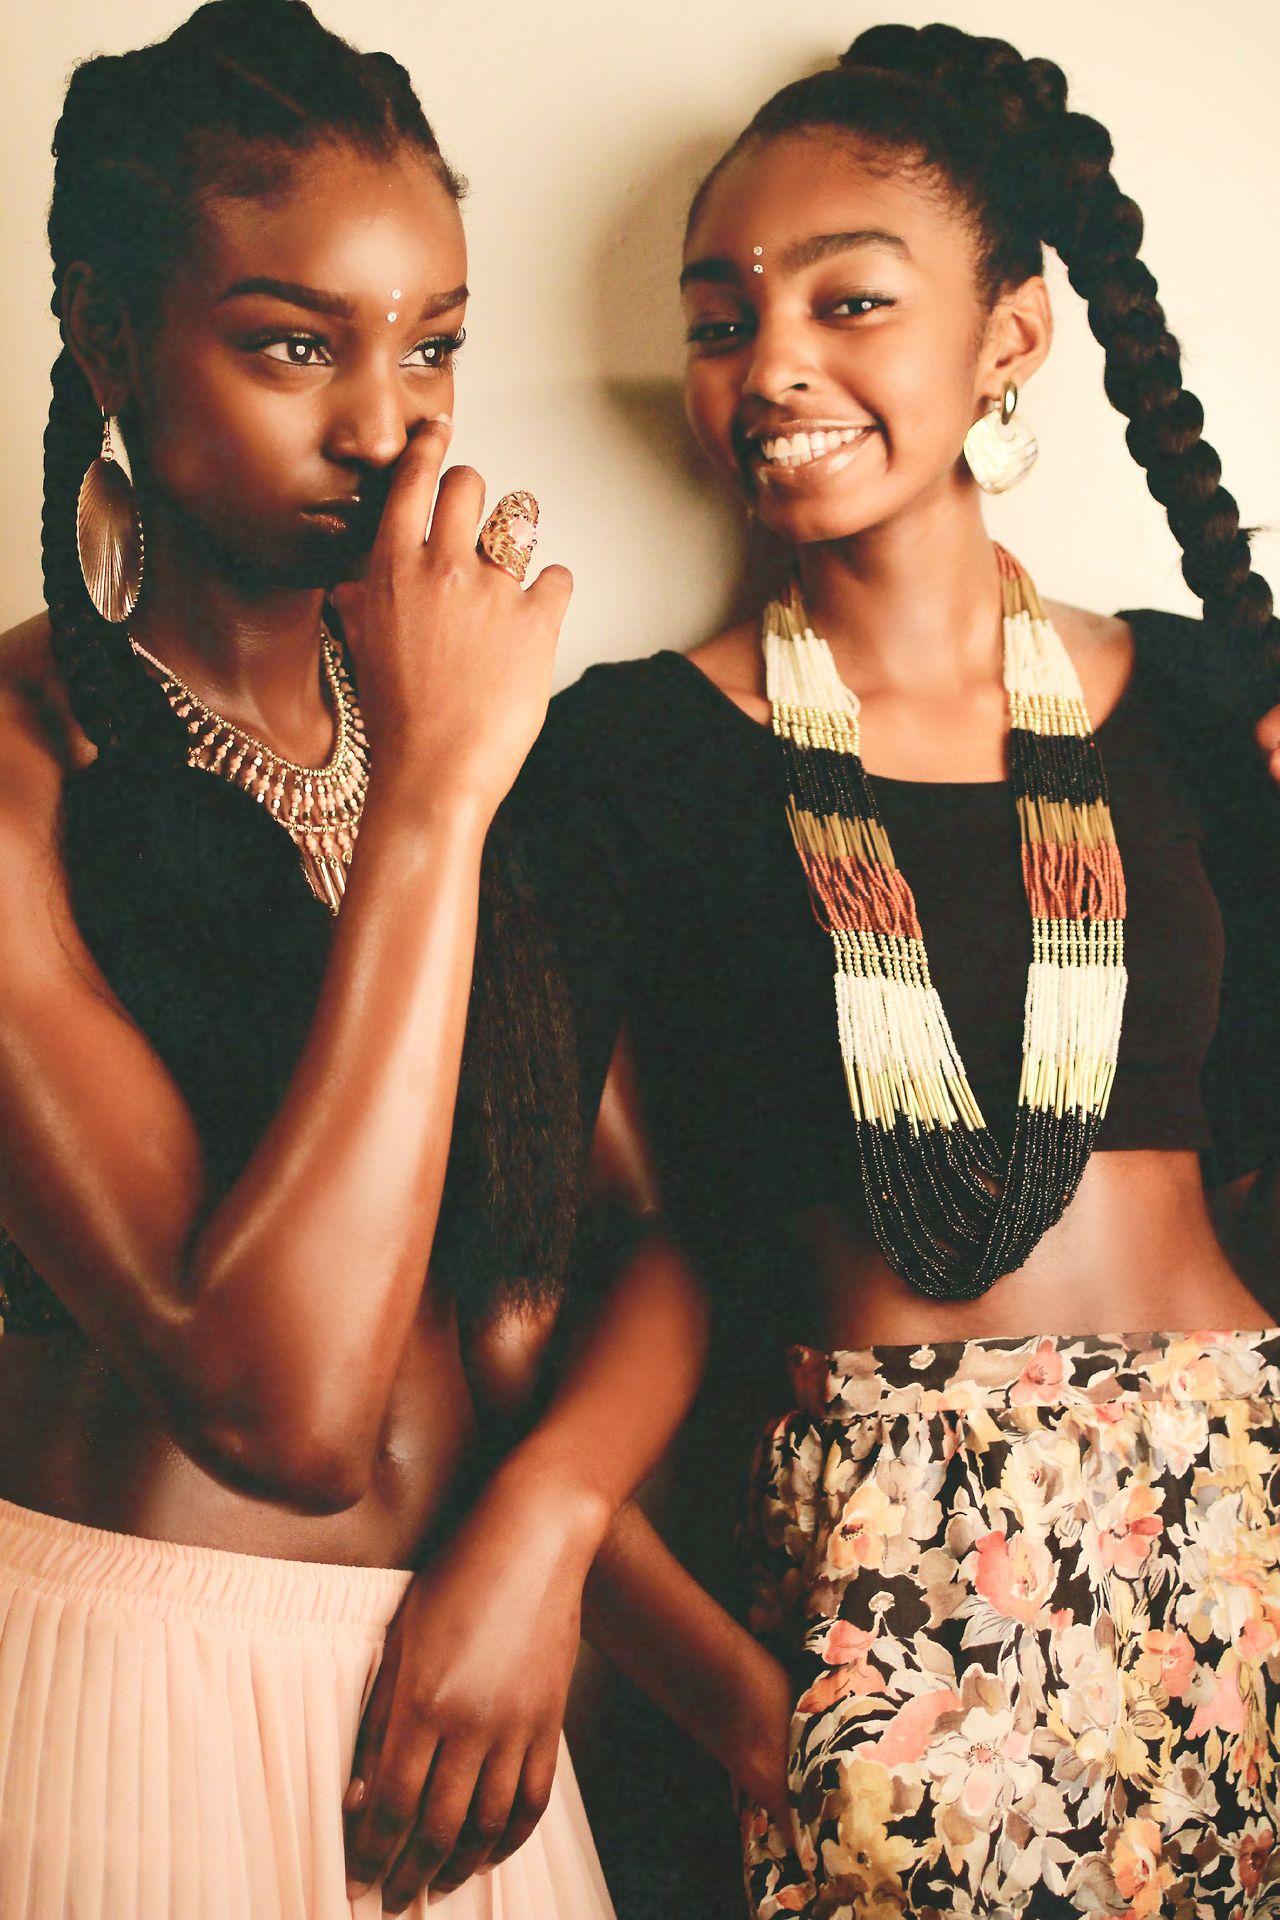 Afro Hairstyles hairstyleforblackwomen.net 22